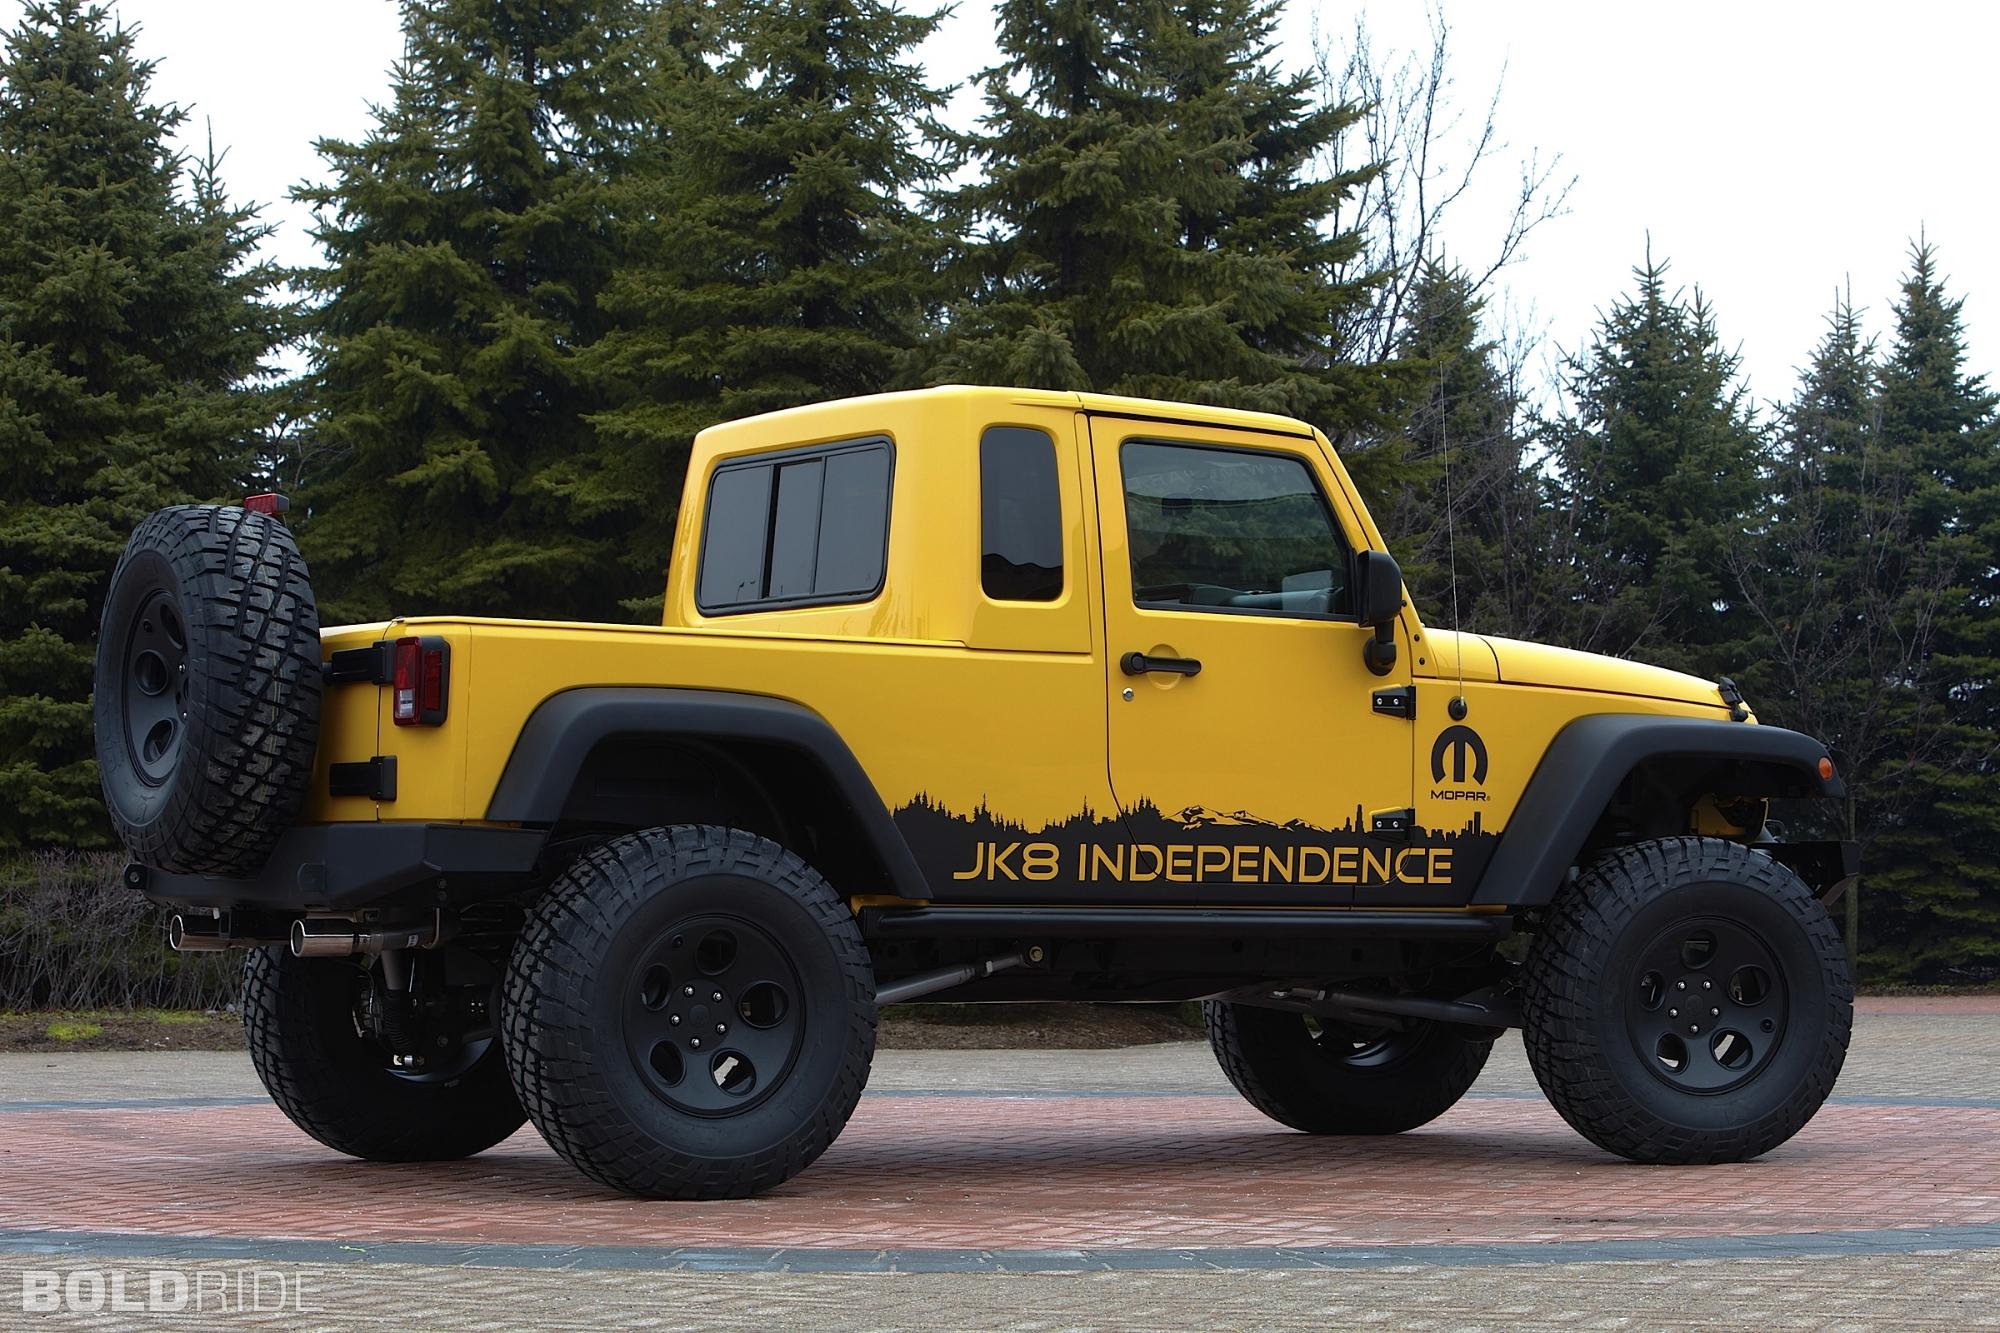 2000 Jeep Wrangler Information and photos ZombieDrive